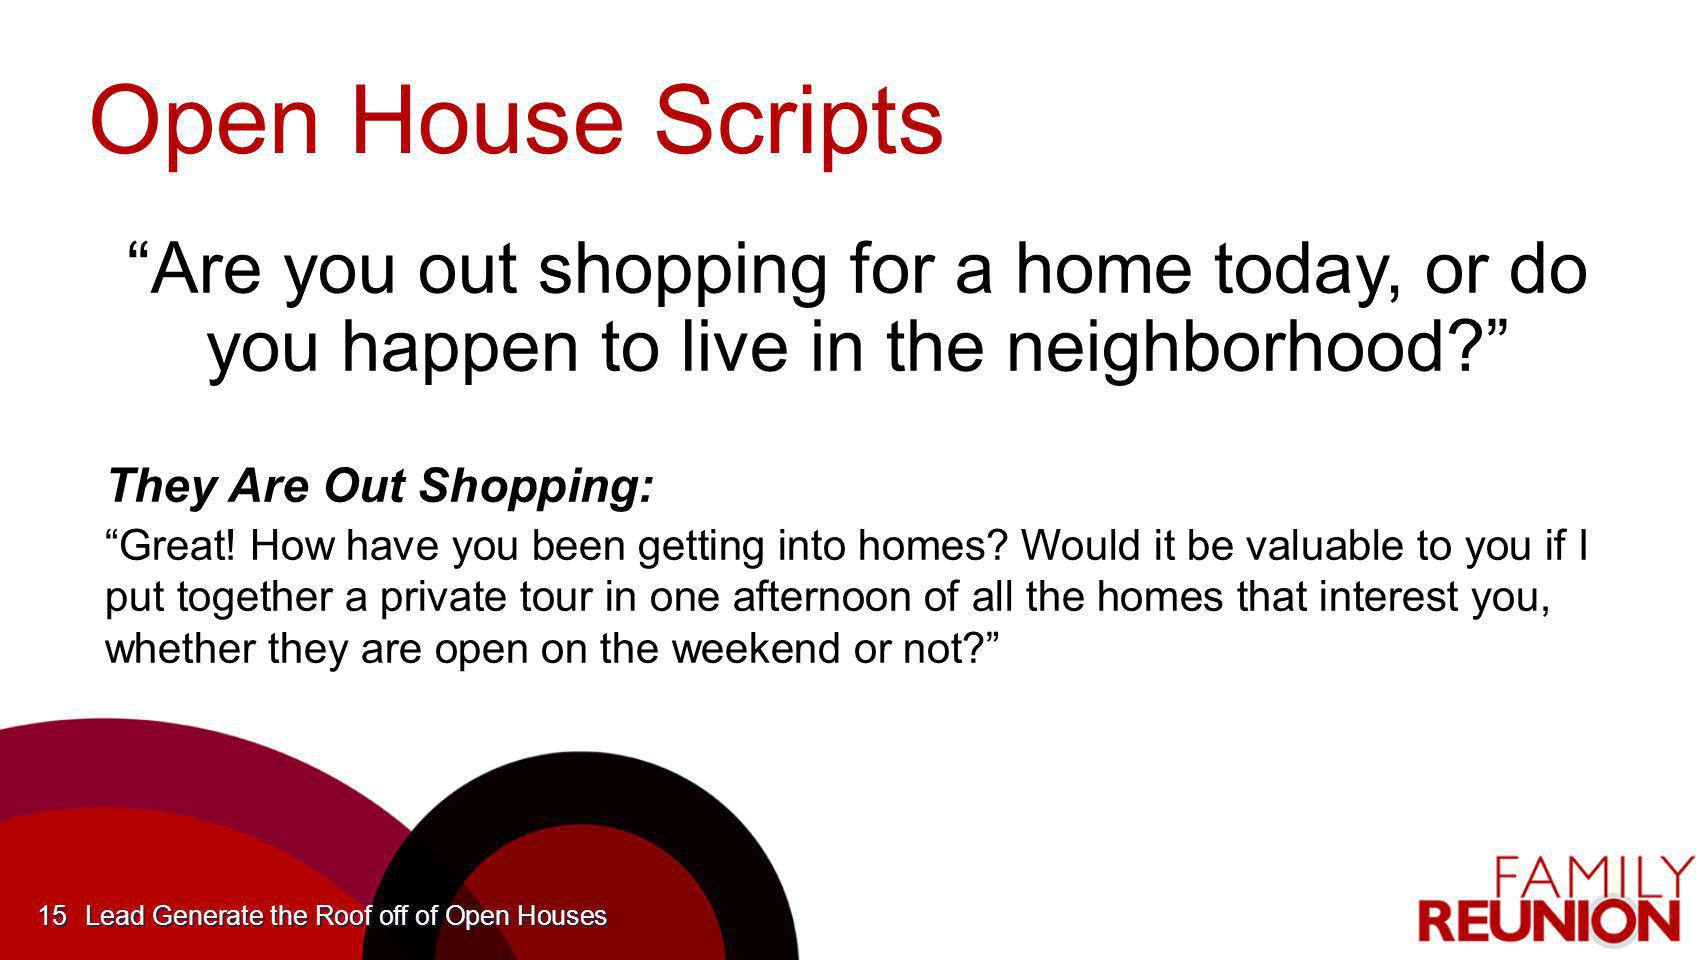 Open House Scripts